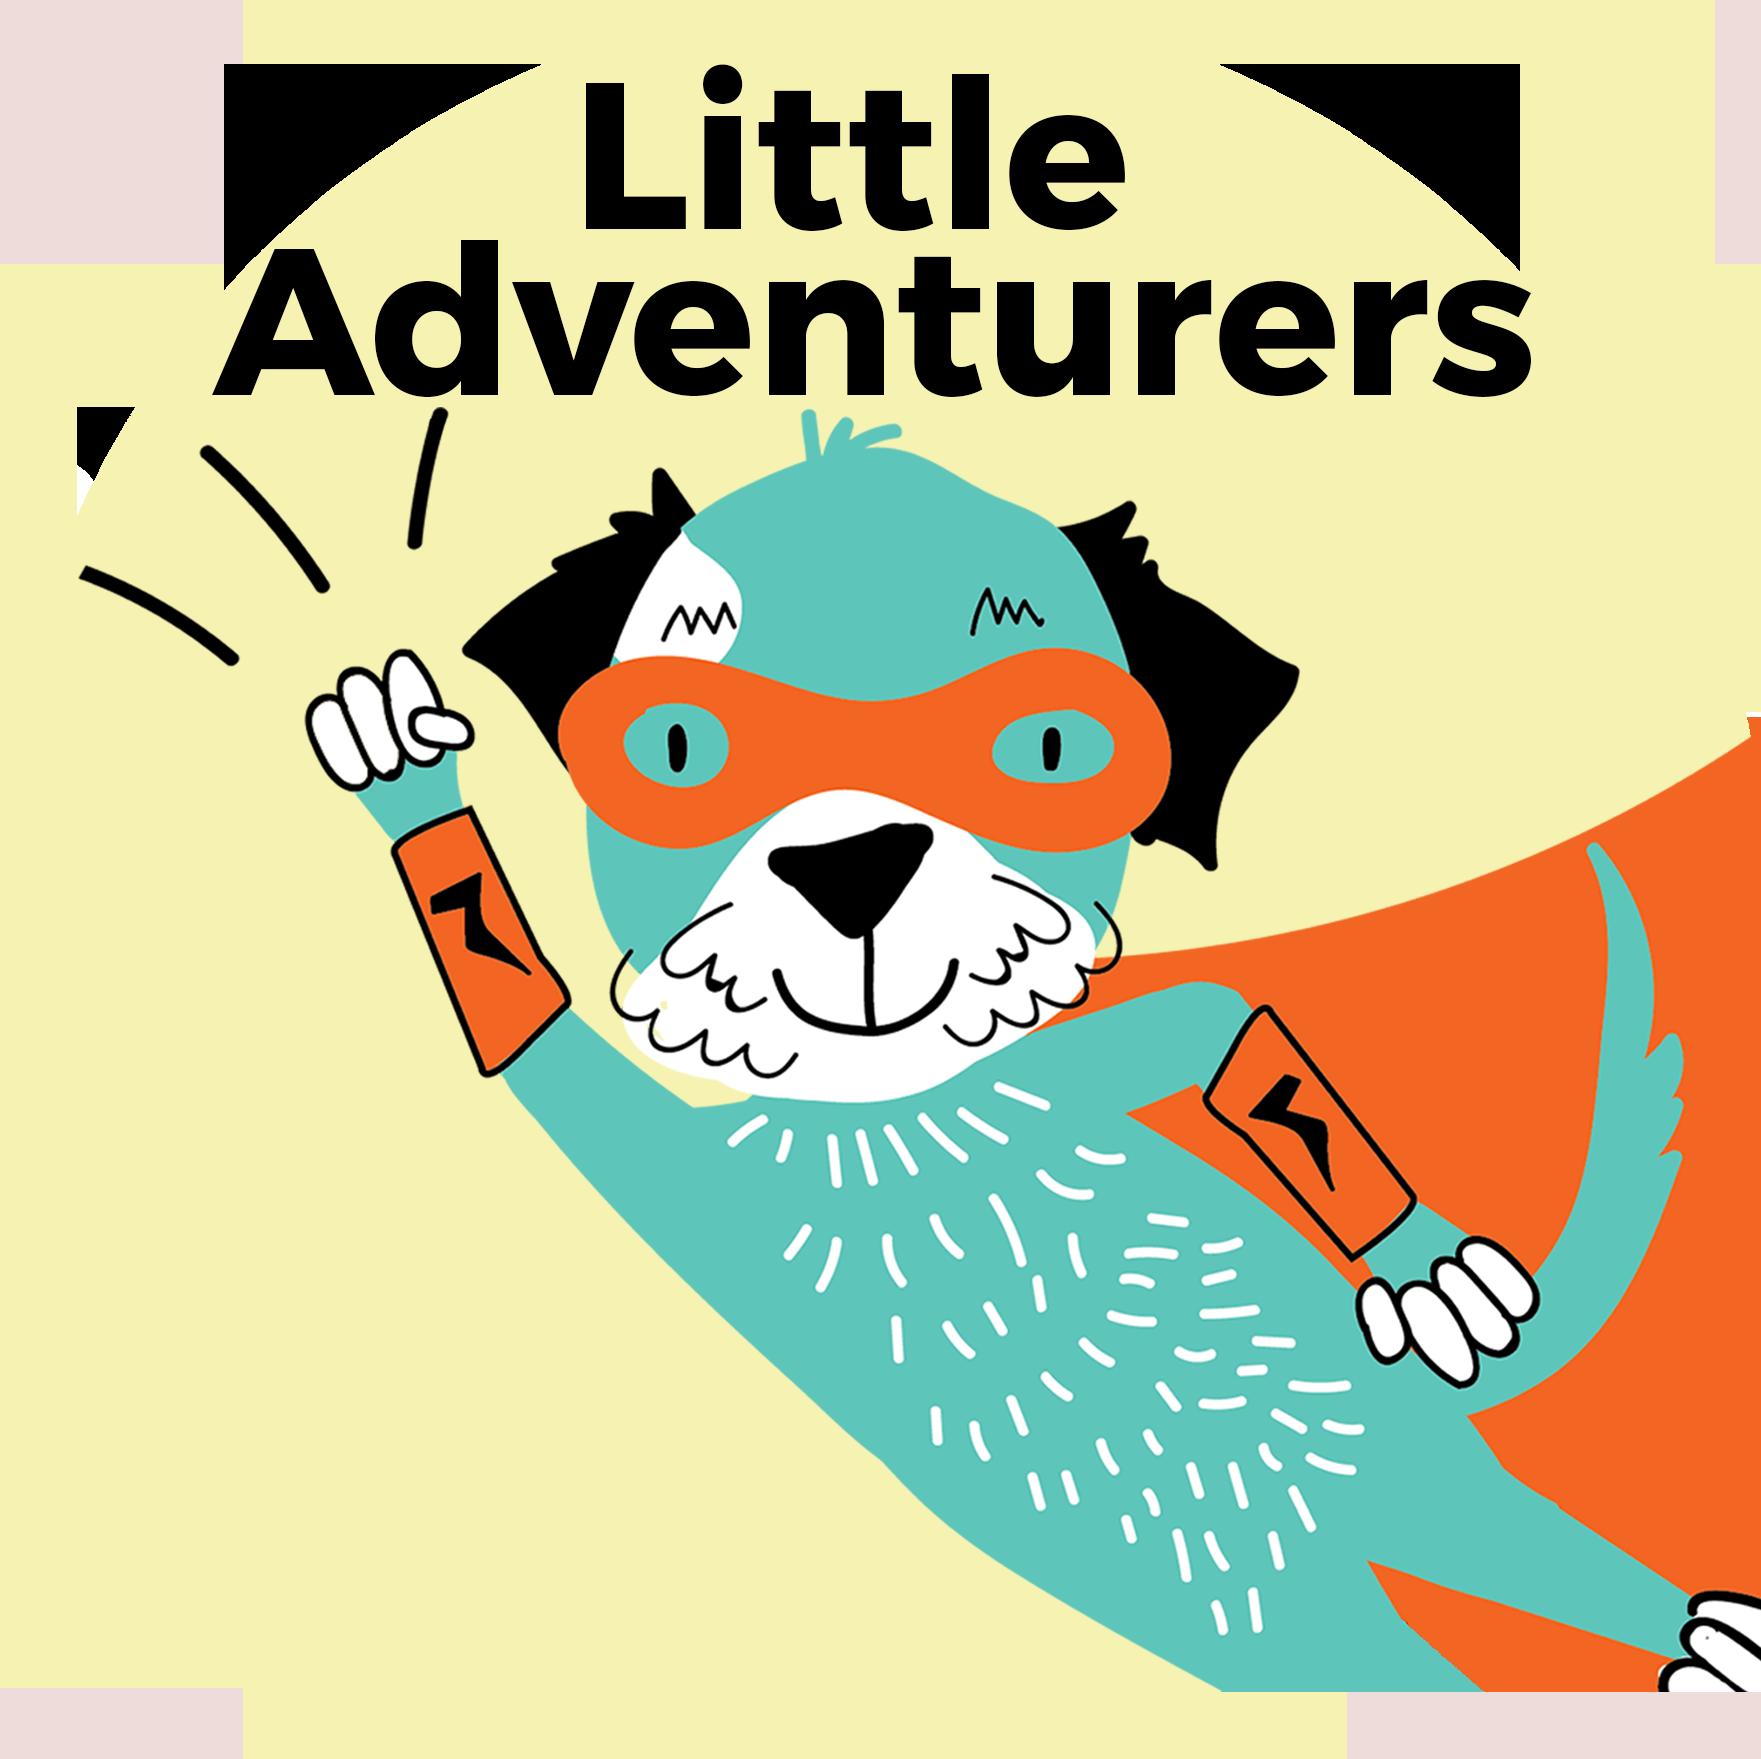 Little Adventurers (2).png